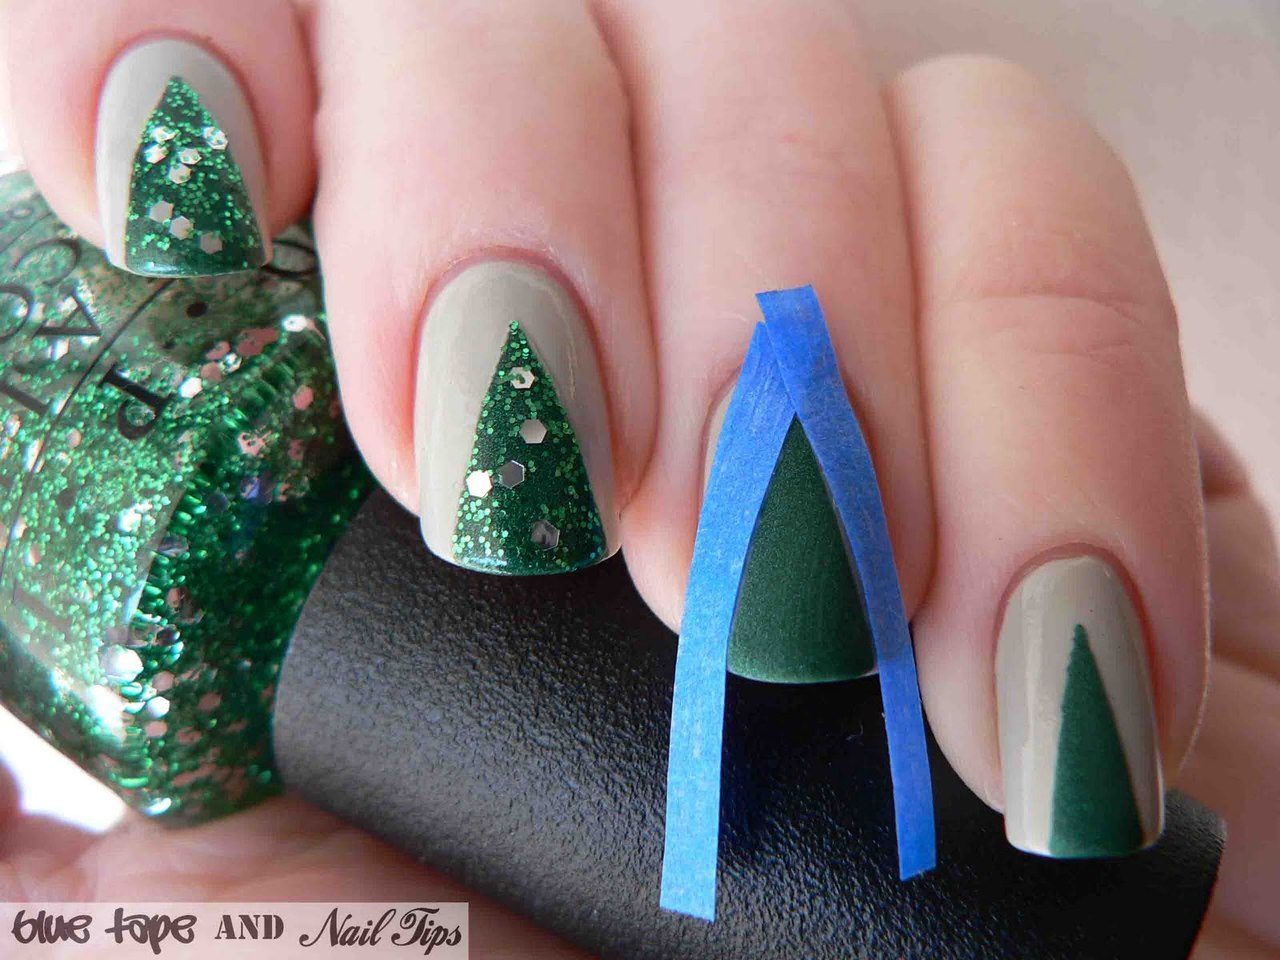 Маникюр на ногтях своими руками фото